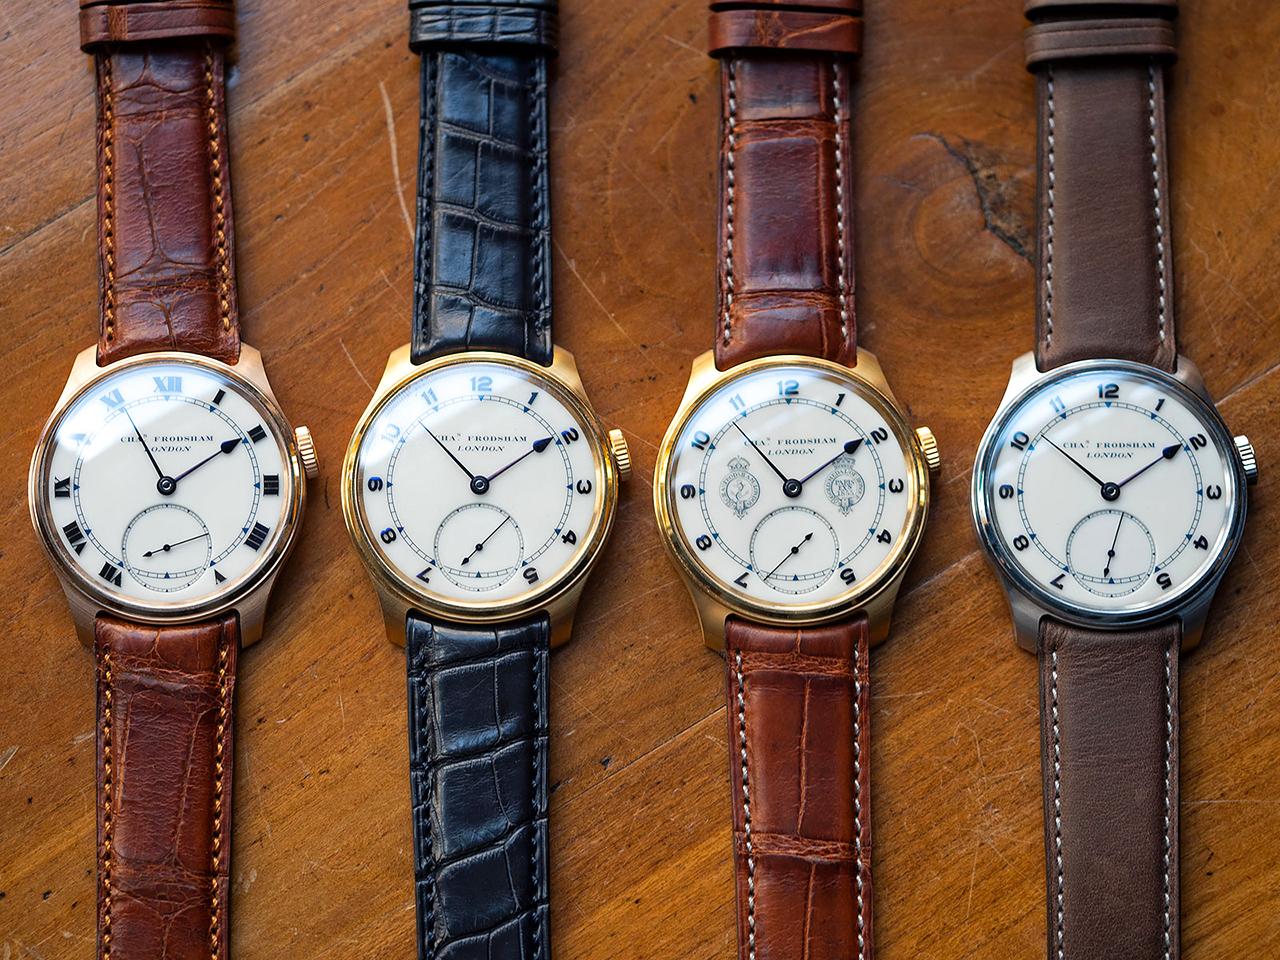 Charles Frodsham Double Impulse ChronometerWristwatch. Fotó: Charles Frodsham